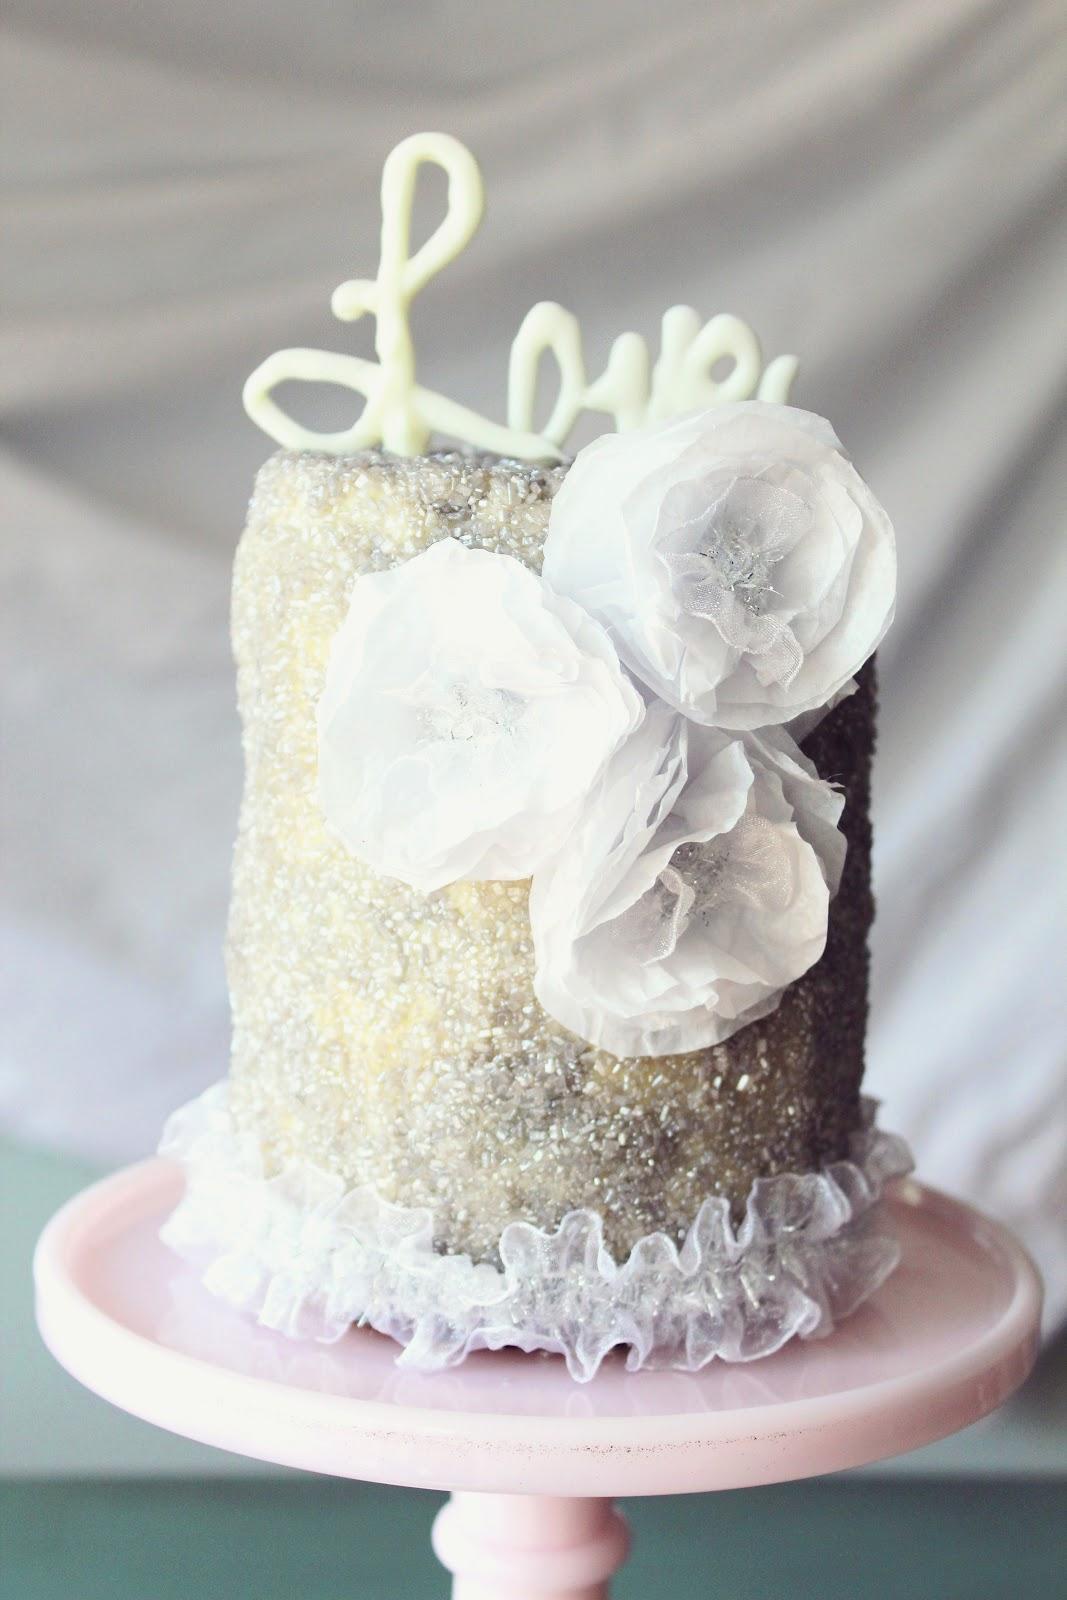 Icing Designs: Mini glittery cake with chocolate deco love topper